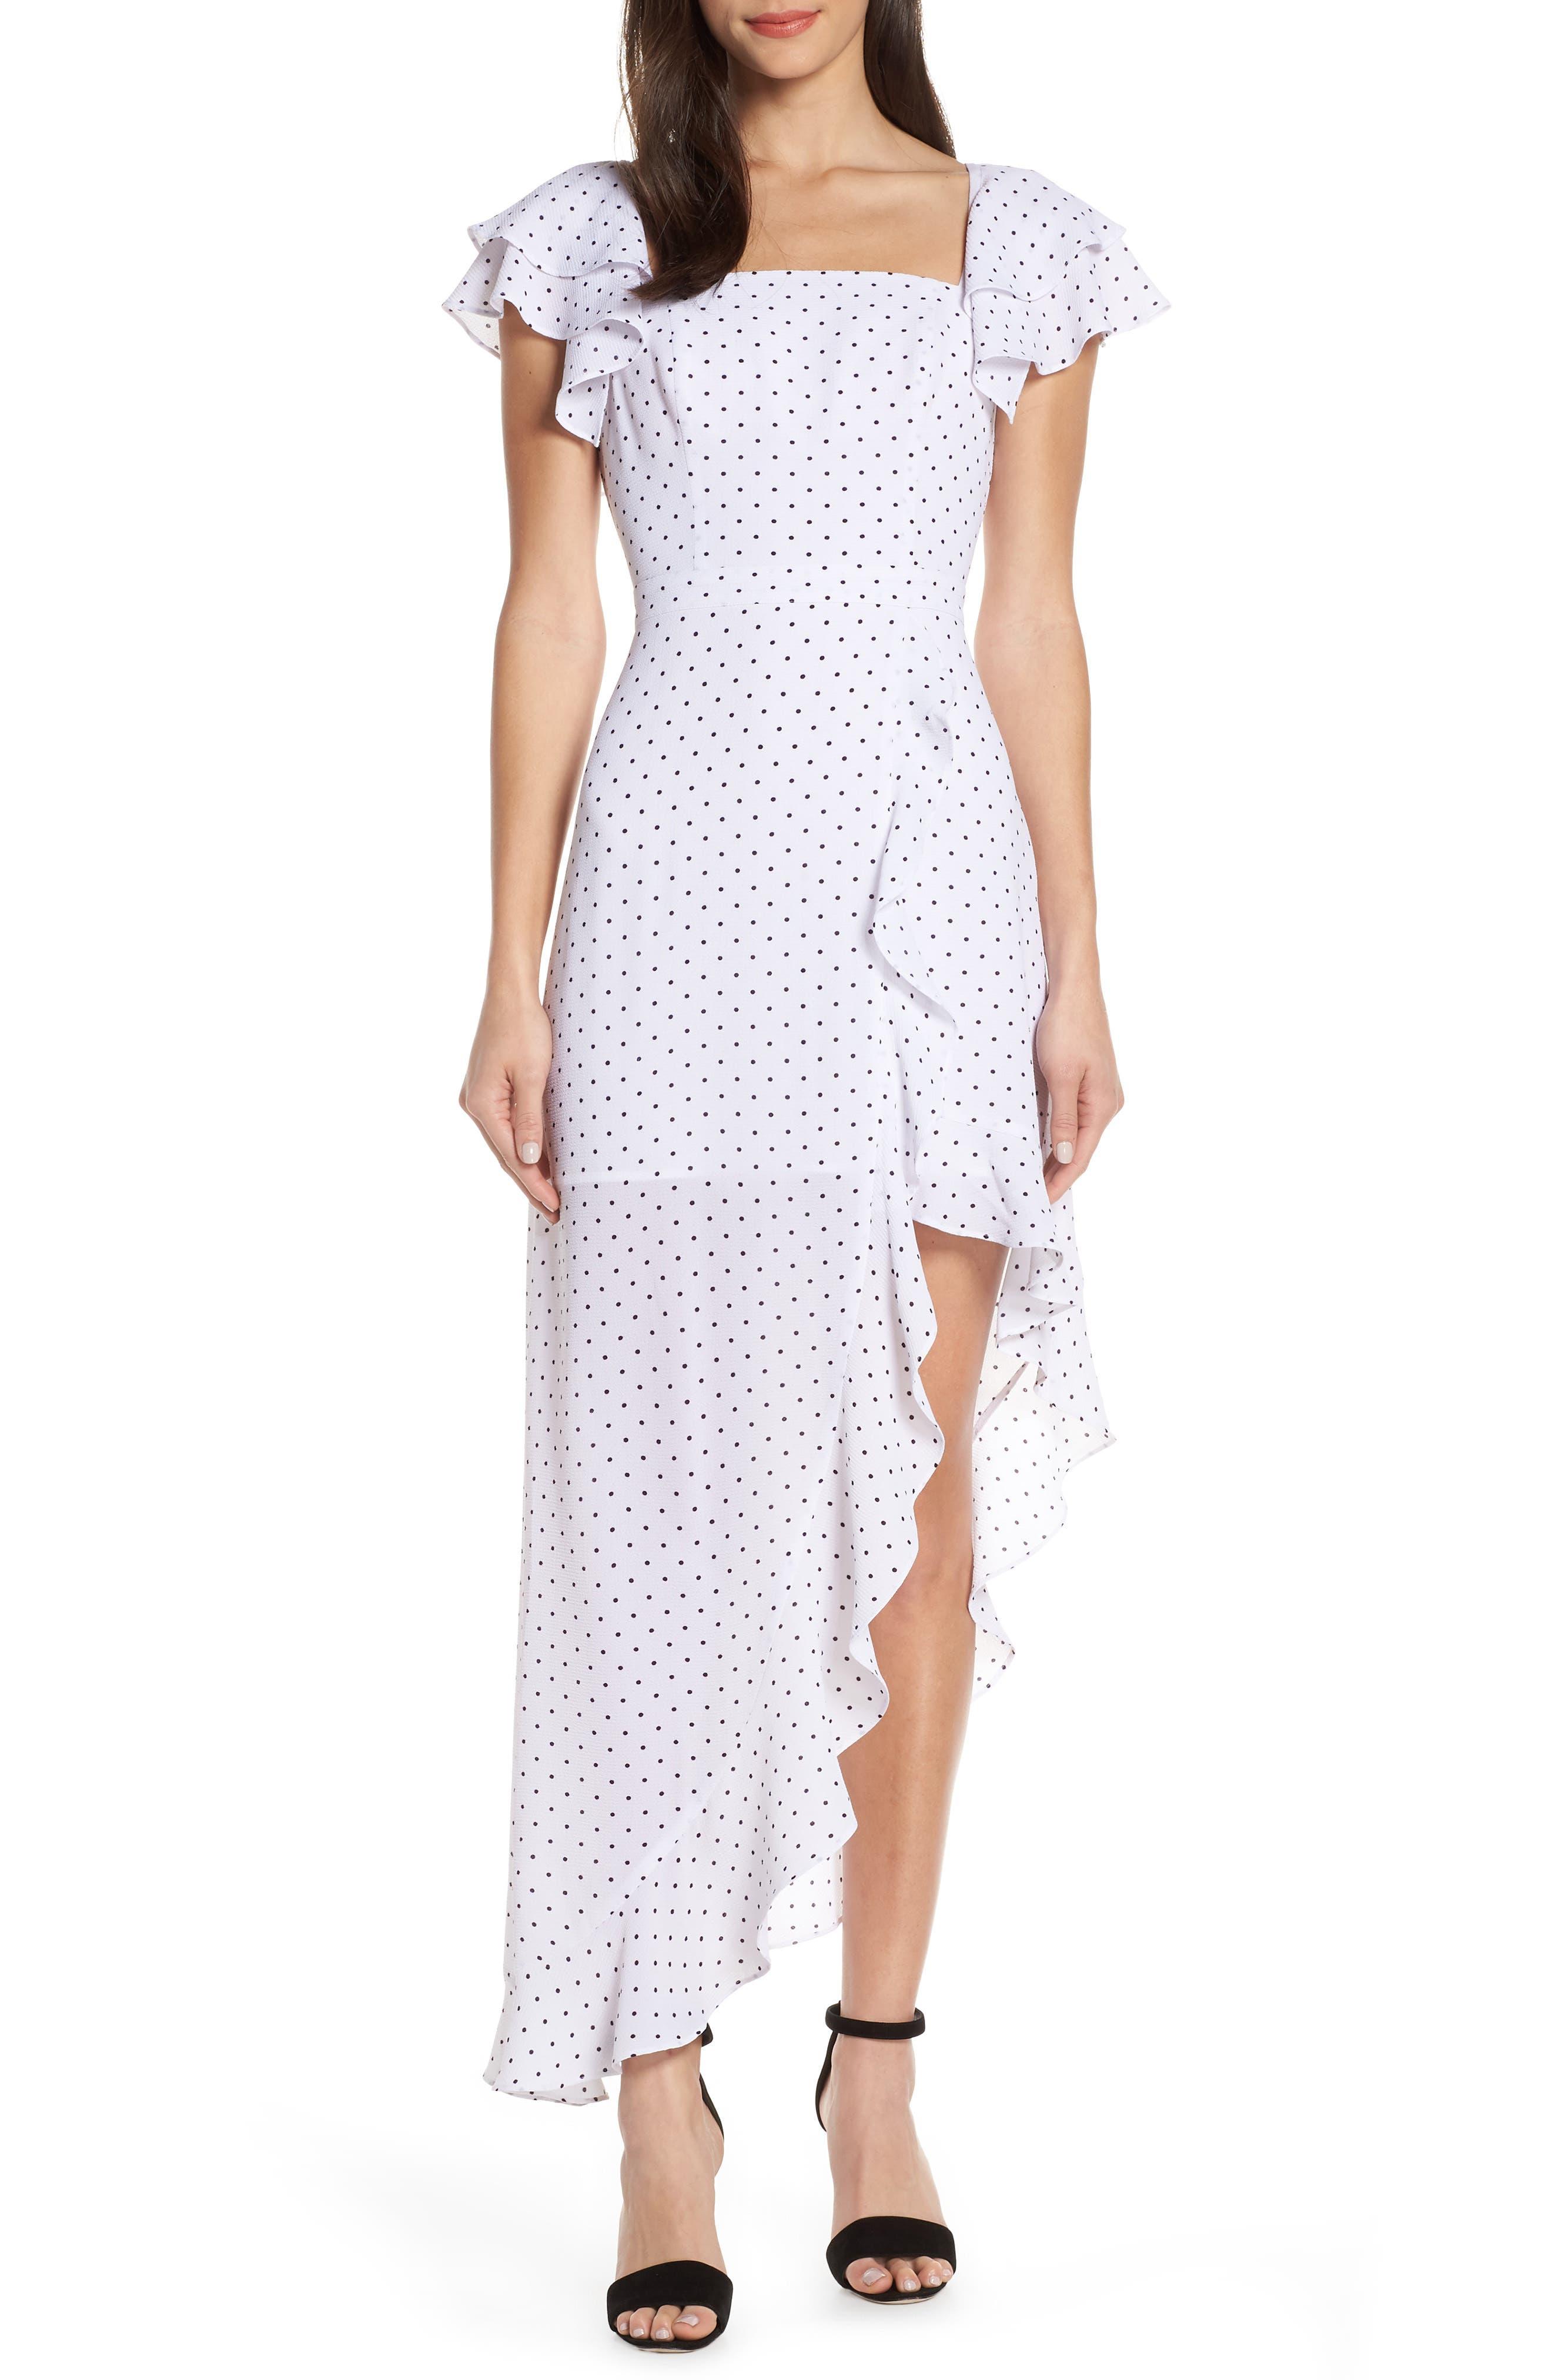 Ali & Jay Terrace Time Polka Dot Maxi Dress, White